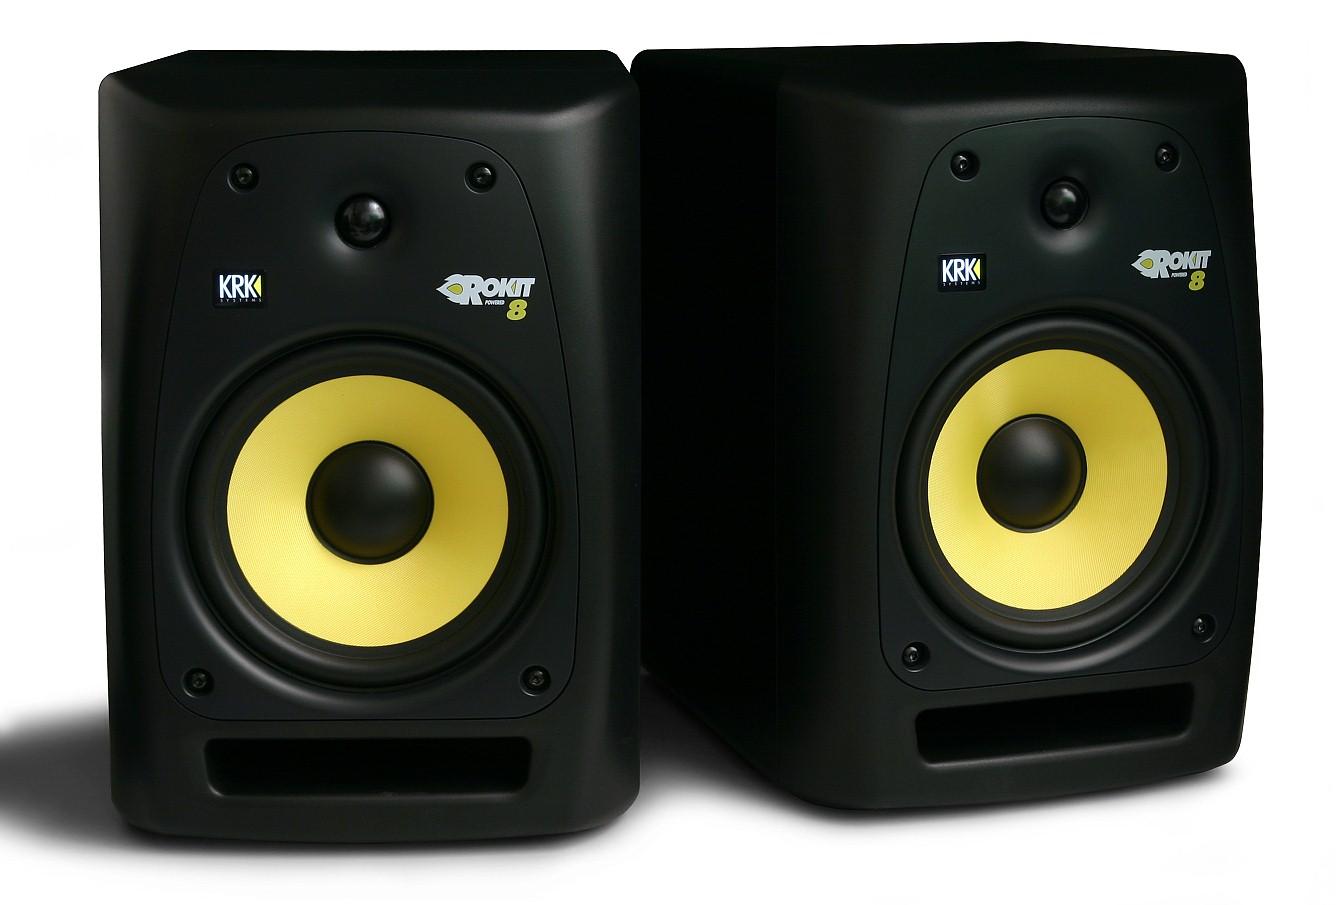 ROKiT: SOLD KRK Rp8 G2 Studio Monitors